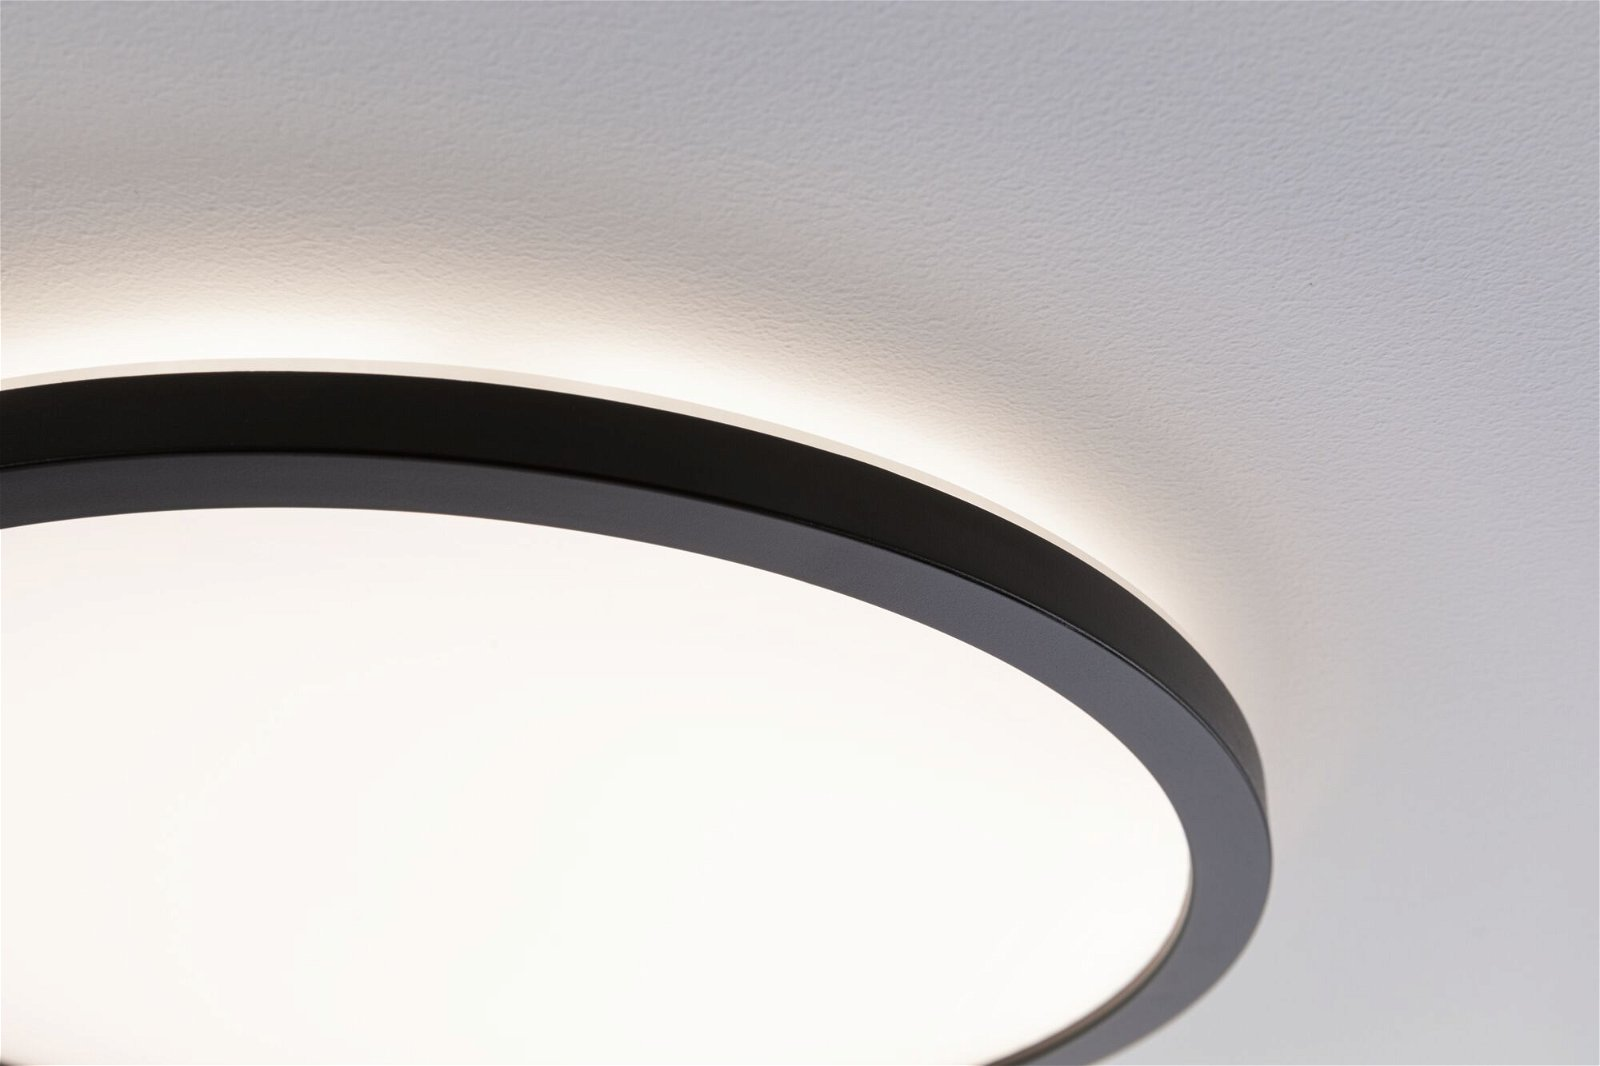 LED Panel Atria Shine rund 190mm 1340lm 3000K Schwarz